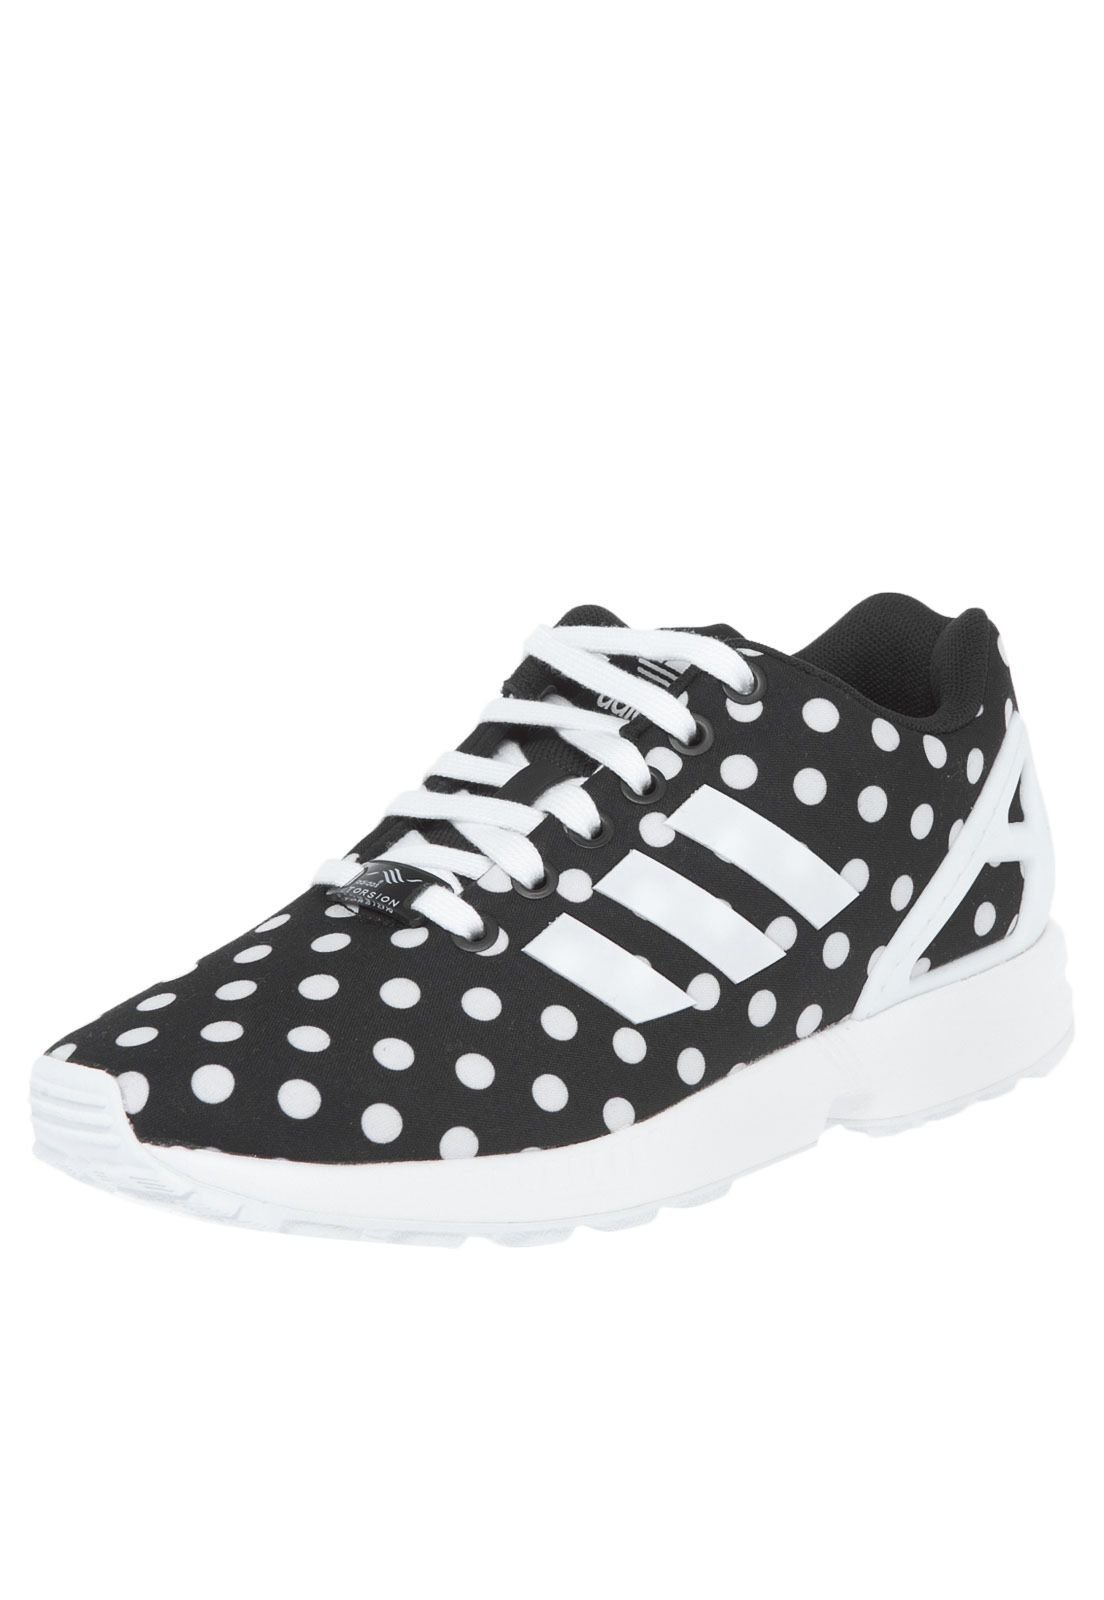 2ab62de5120 Tênis adidas Originals Zx Flux W Preto - Marca Adidas Originals ...